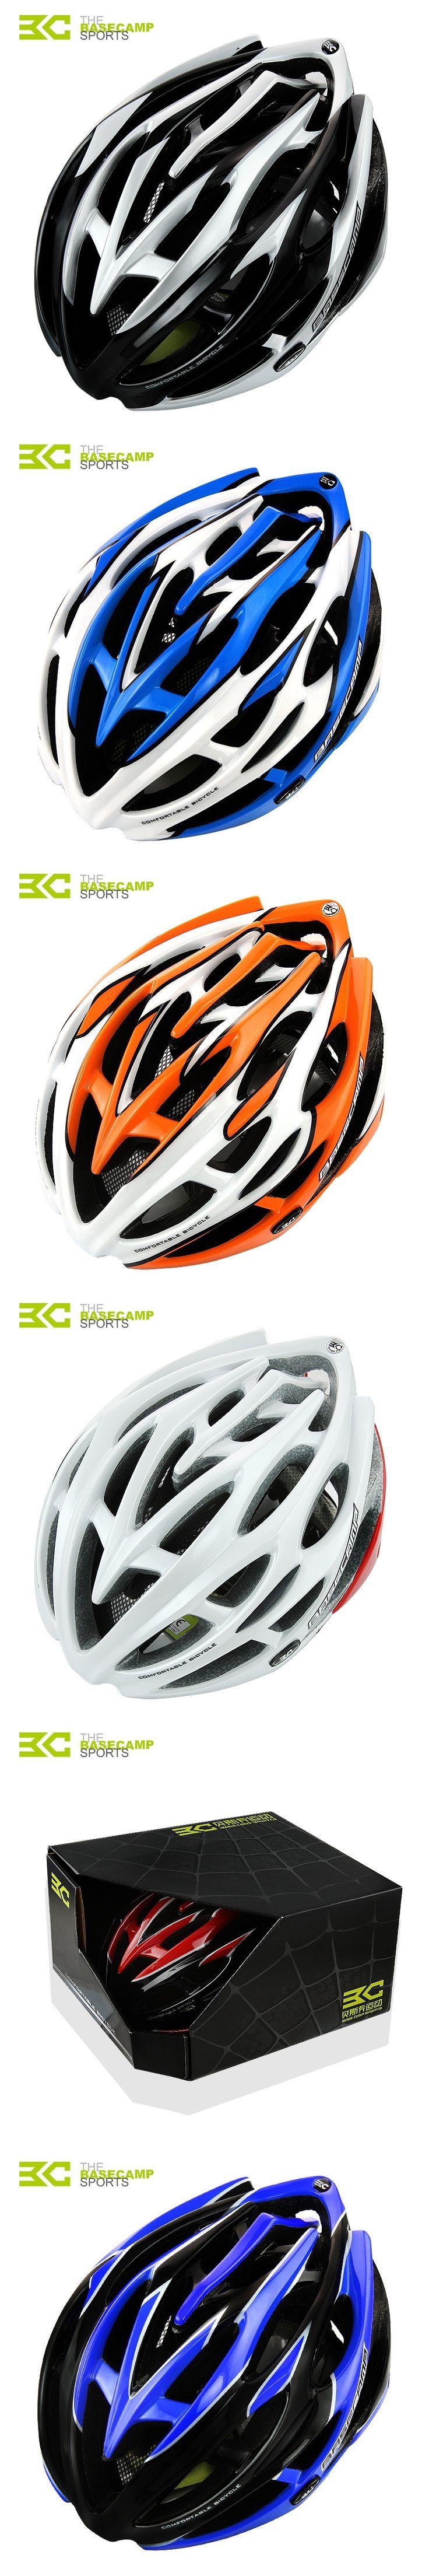 Cycling Helmet Bicycle Helmet Casco Ciclismo MTB Casco Bici Capacete Ciclismo Estrada Kask Mold Equipment Customized Helmets